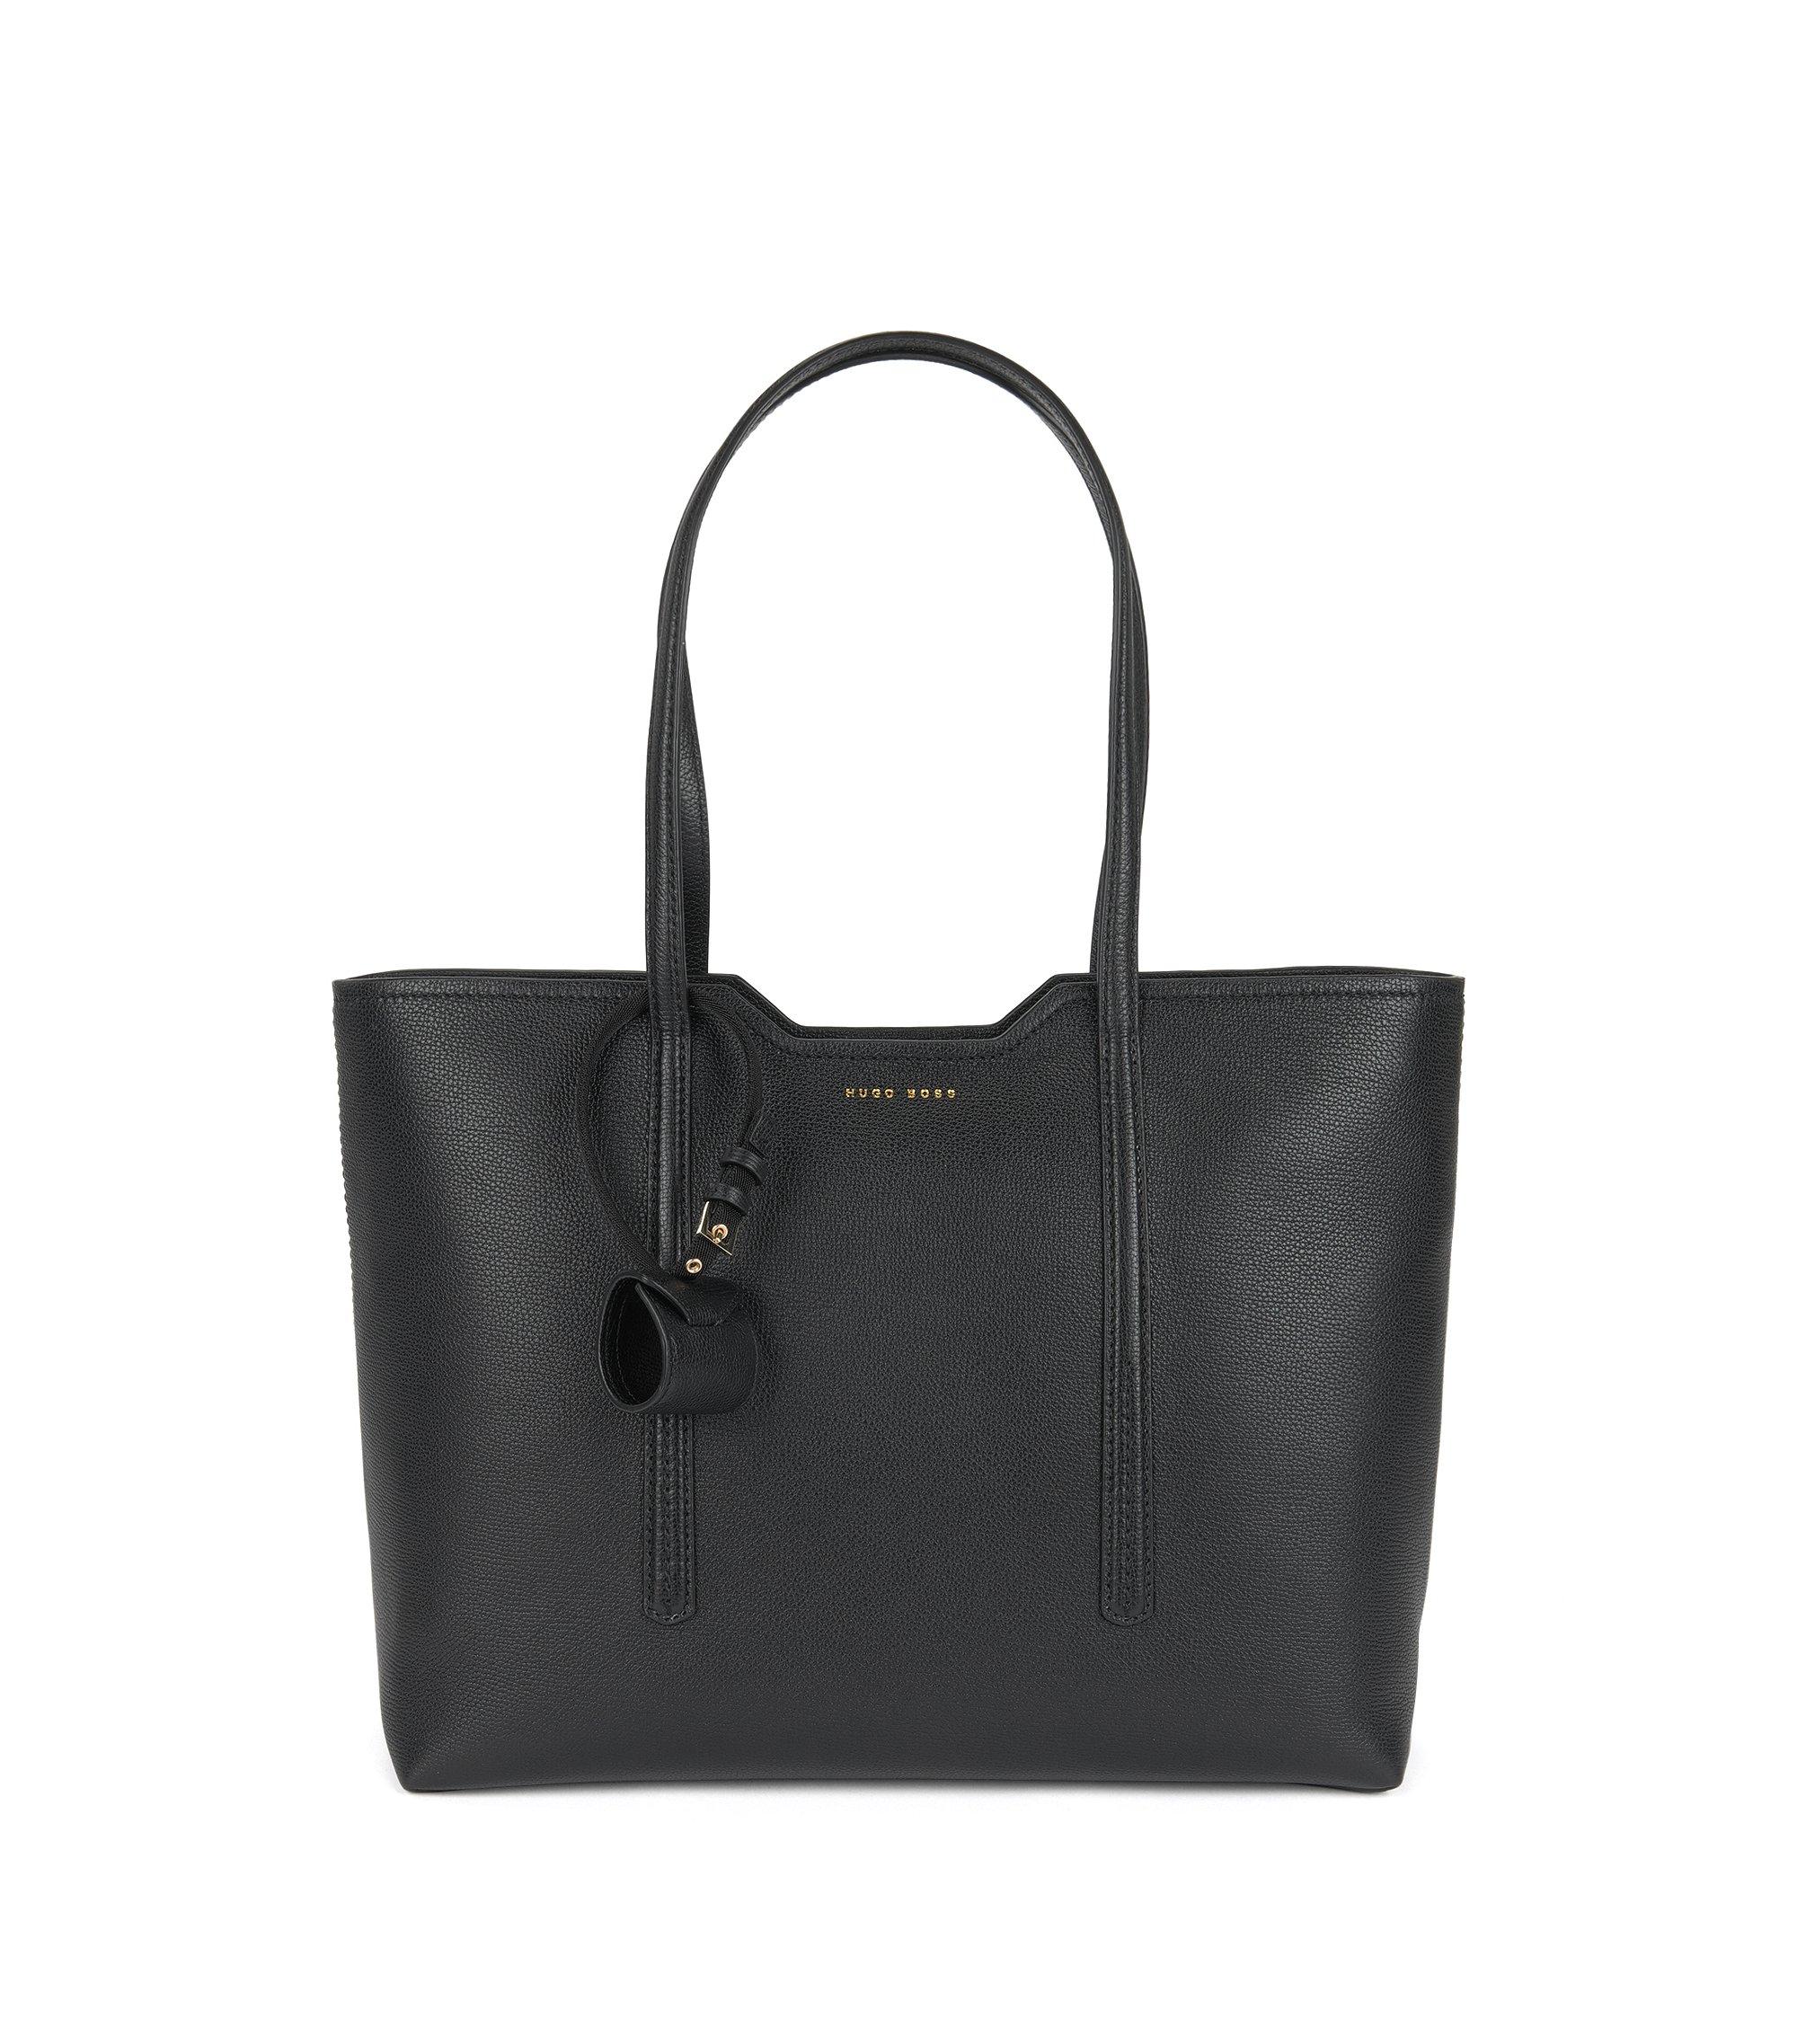 Leather Shopper Tote | Taylor Shopper, Black